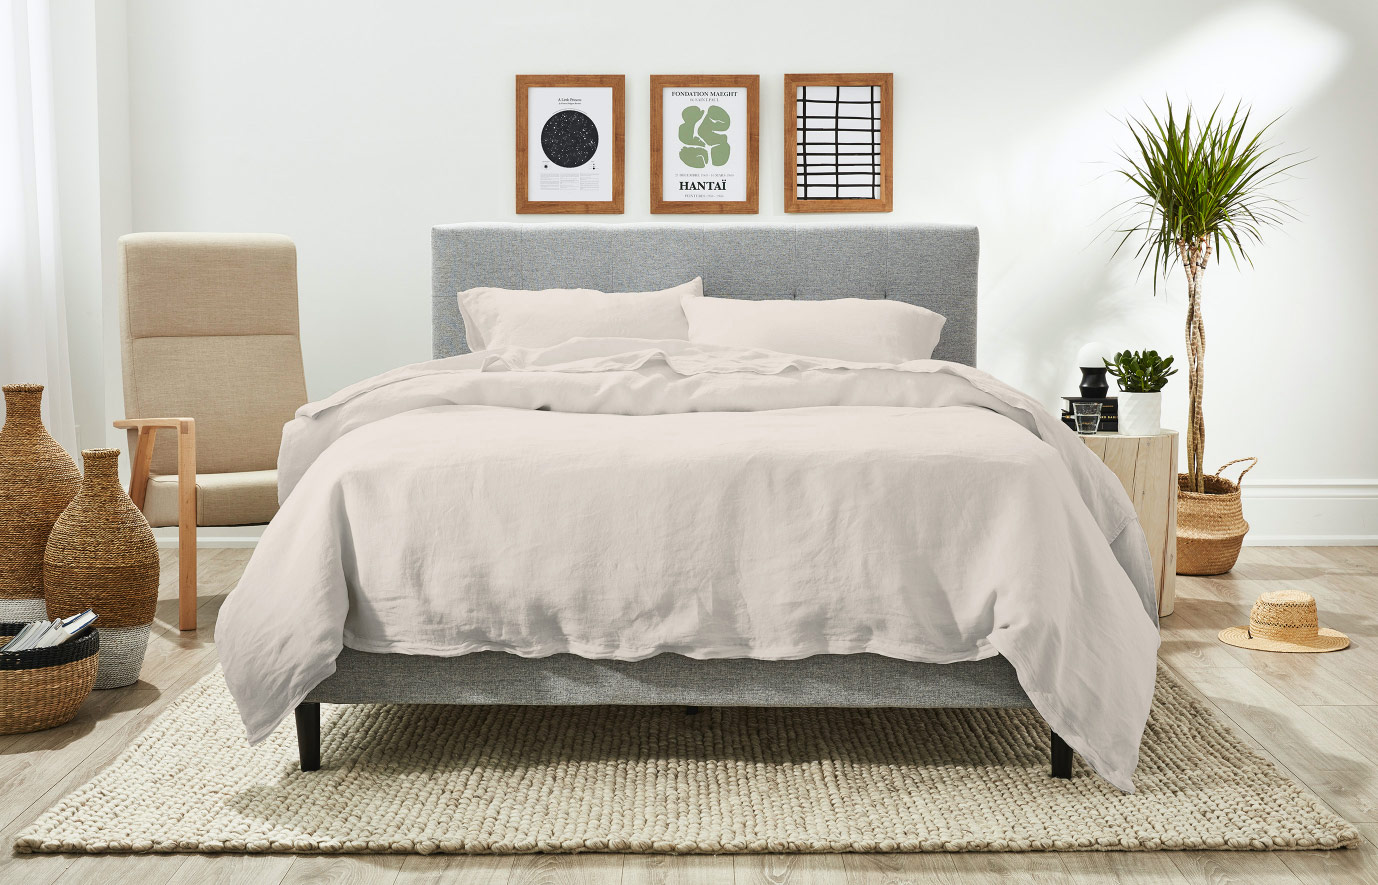 Lino naturale Scandi style 100/% eco linen pillowcase Enzima ammorbidito. federa stile Scandi Premium organic textiles Enzyme softened